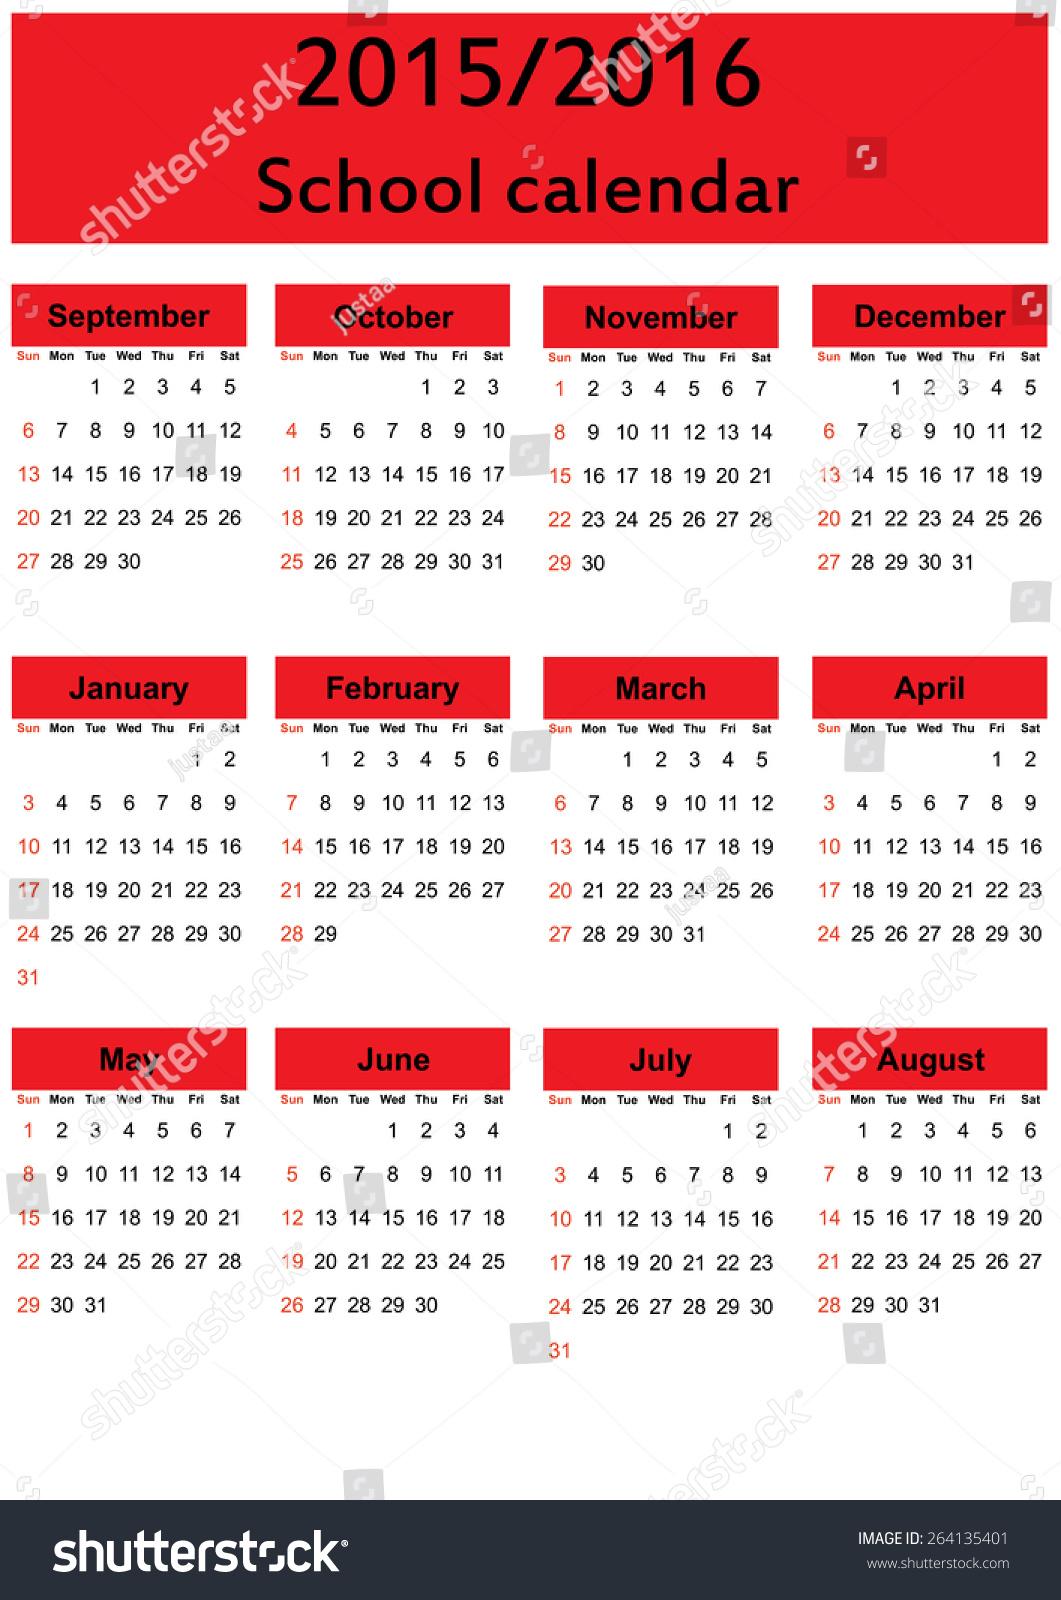 Year Calendar Vector : School calendar on new year stock vector